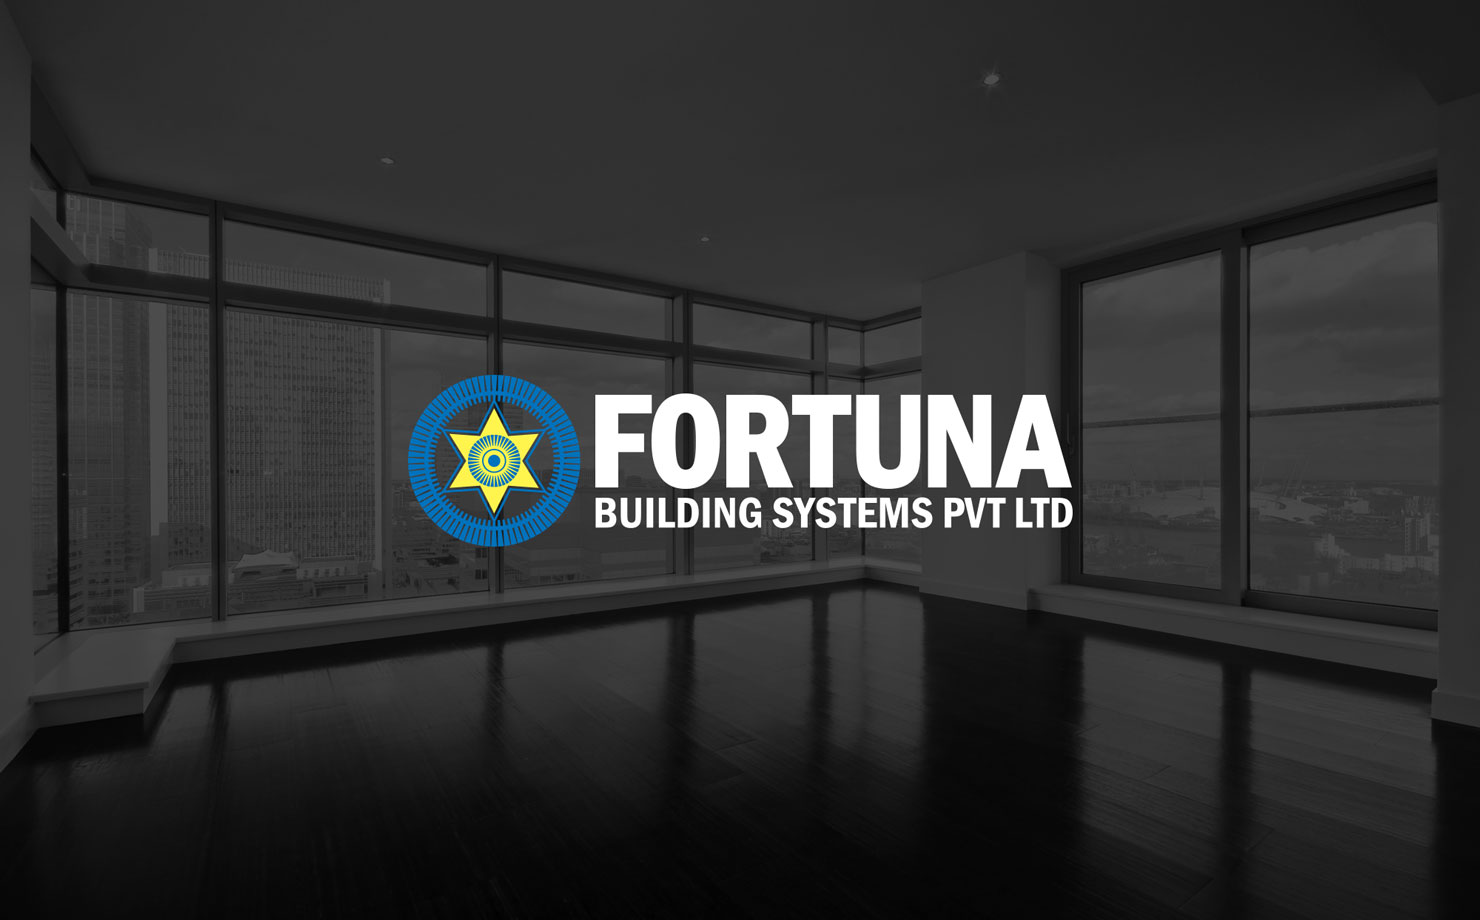 logo-design-fortuna1